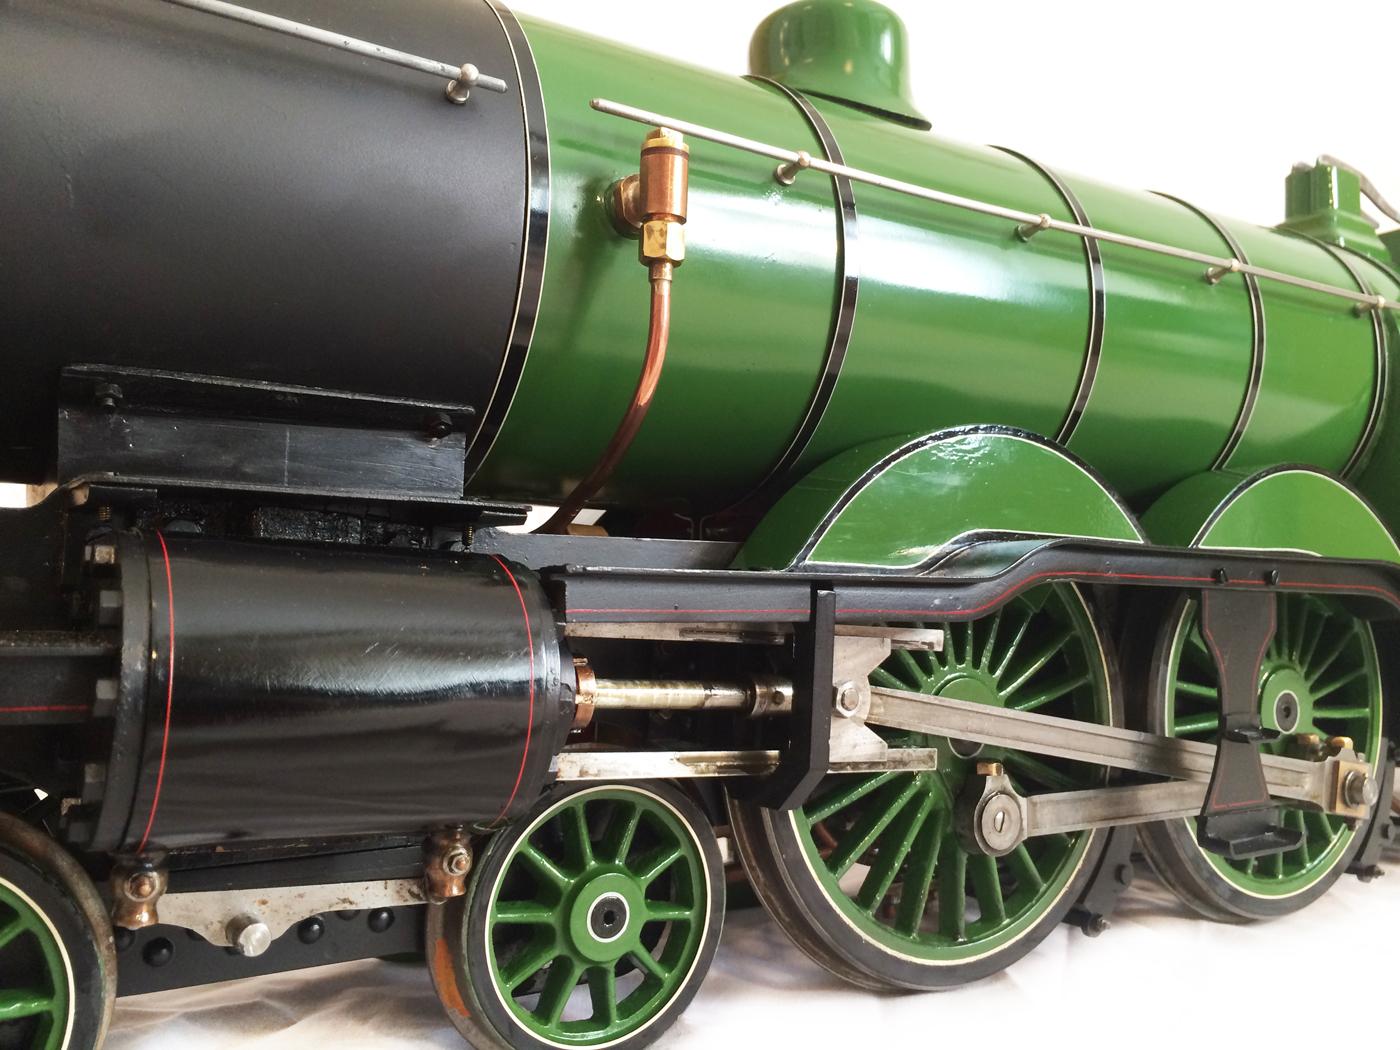 test 3 inch gauge Ivatt C1 Atlantic LBSC Maisie live steam locomotive for sale 19